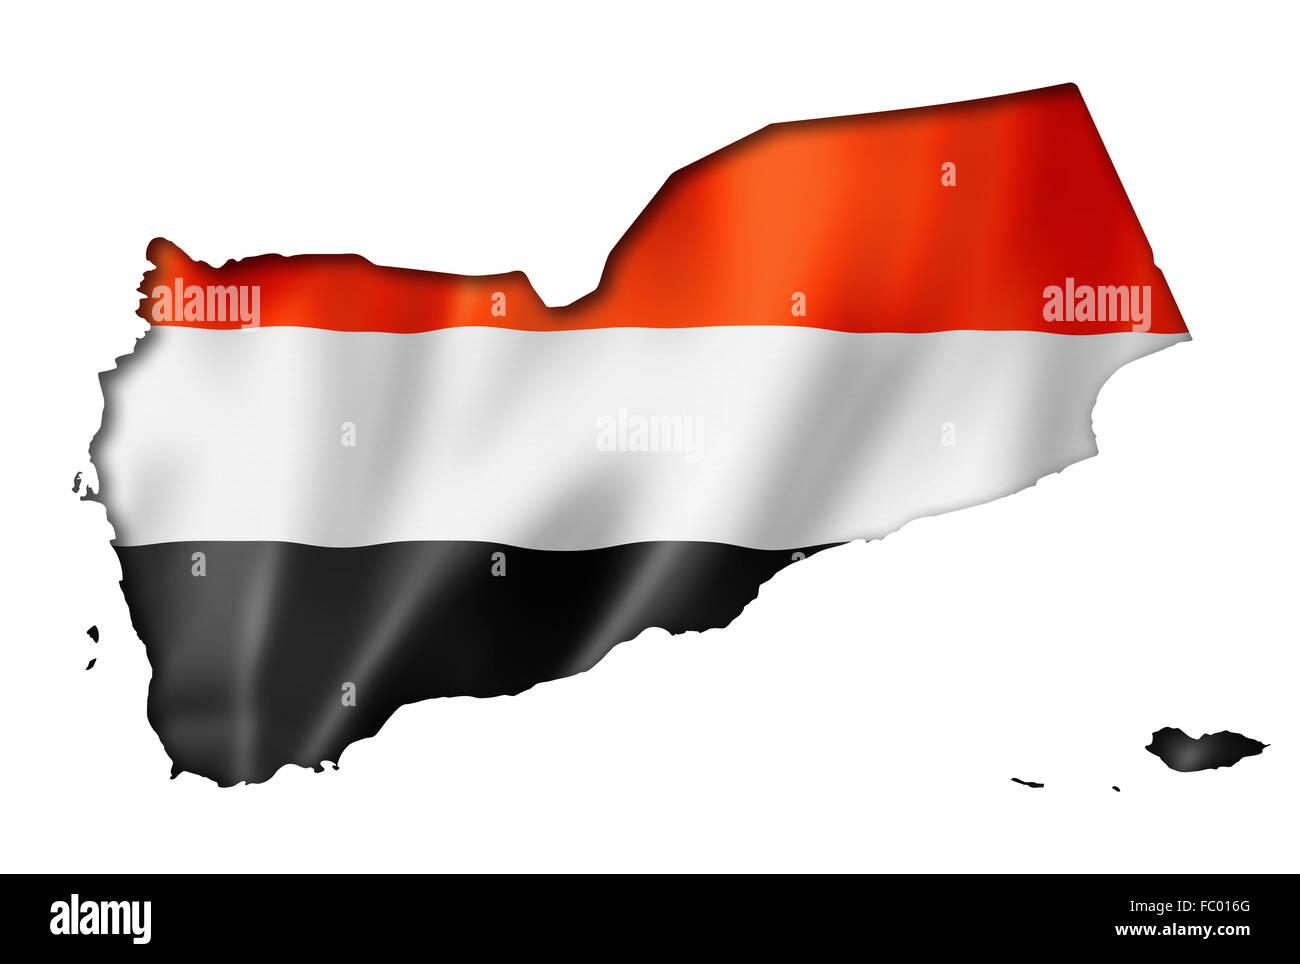 Yemen flag map - Stock Image